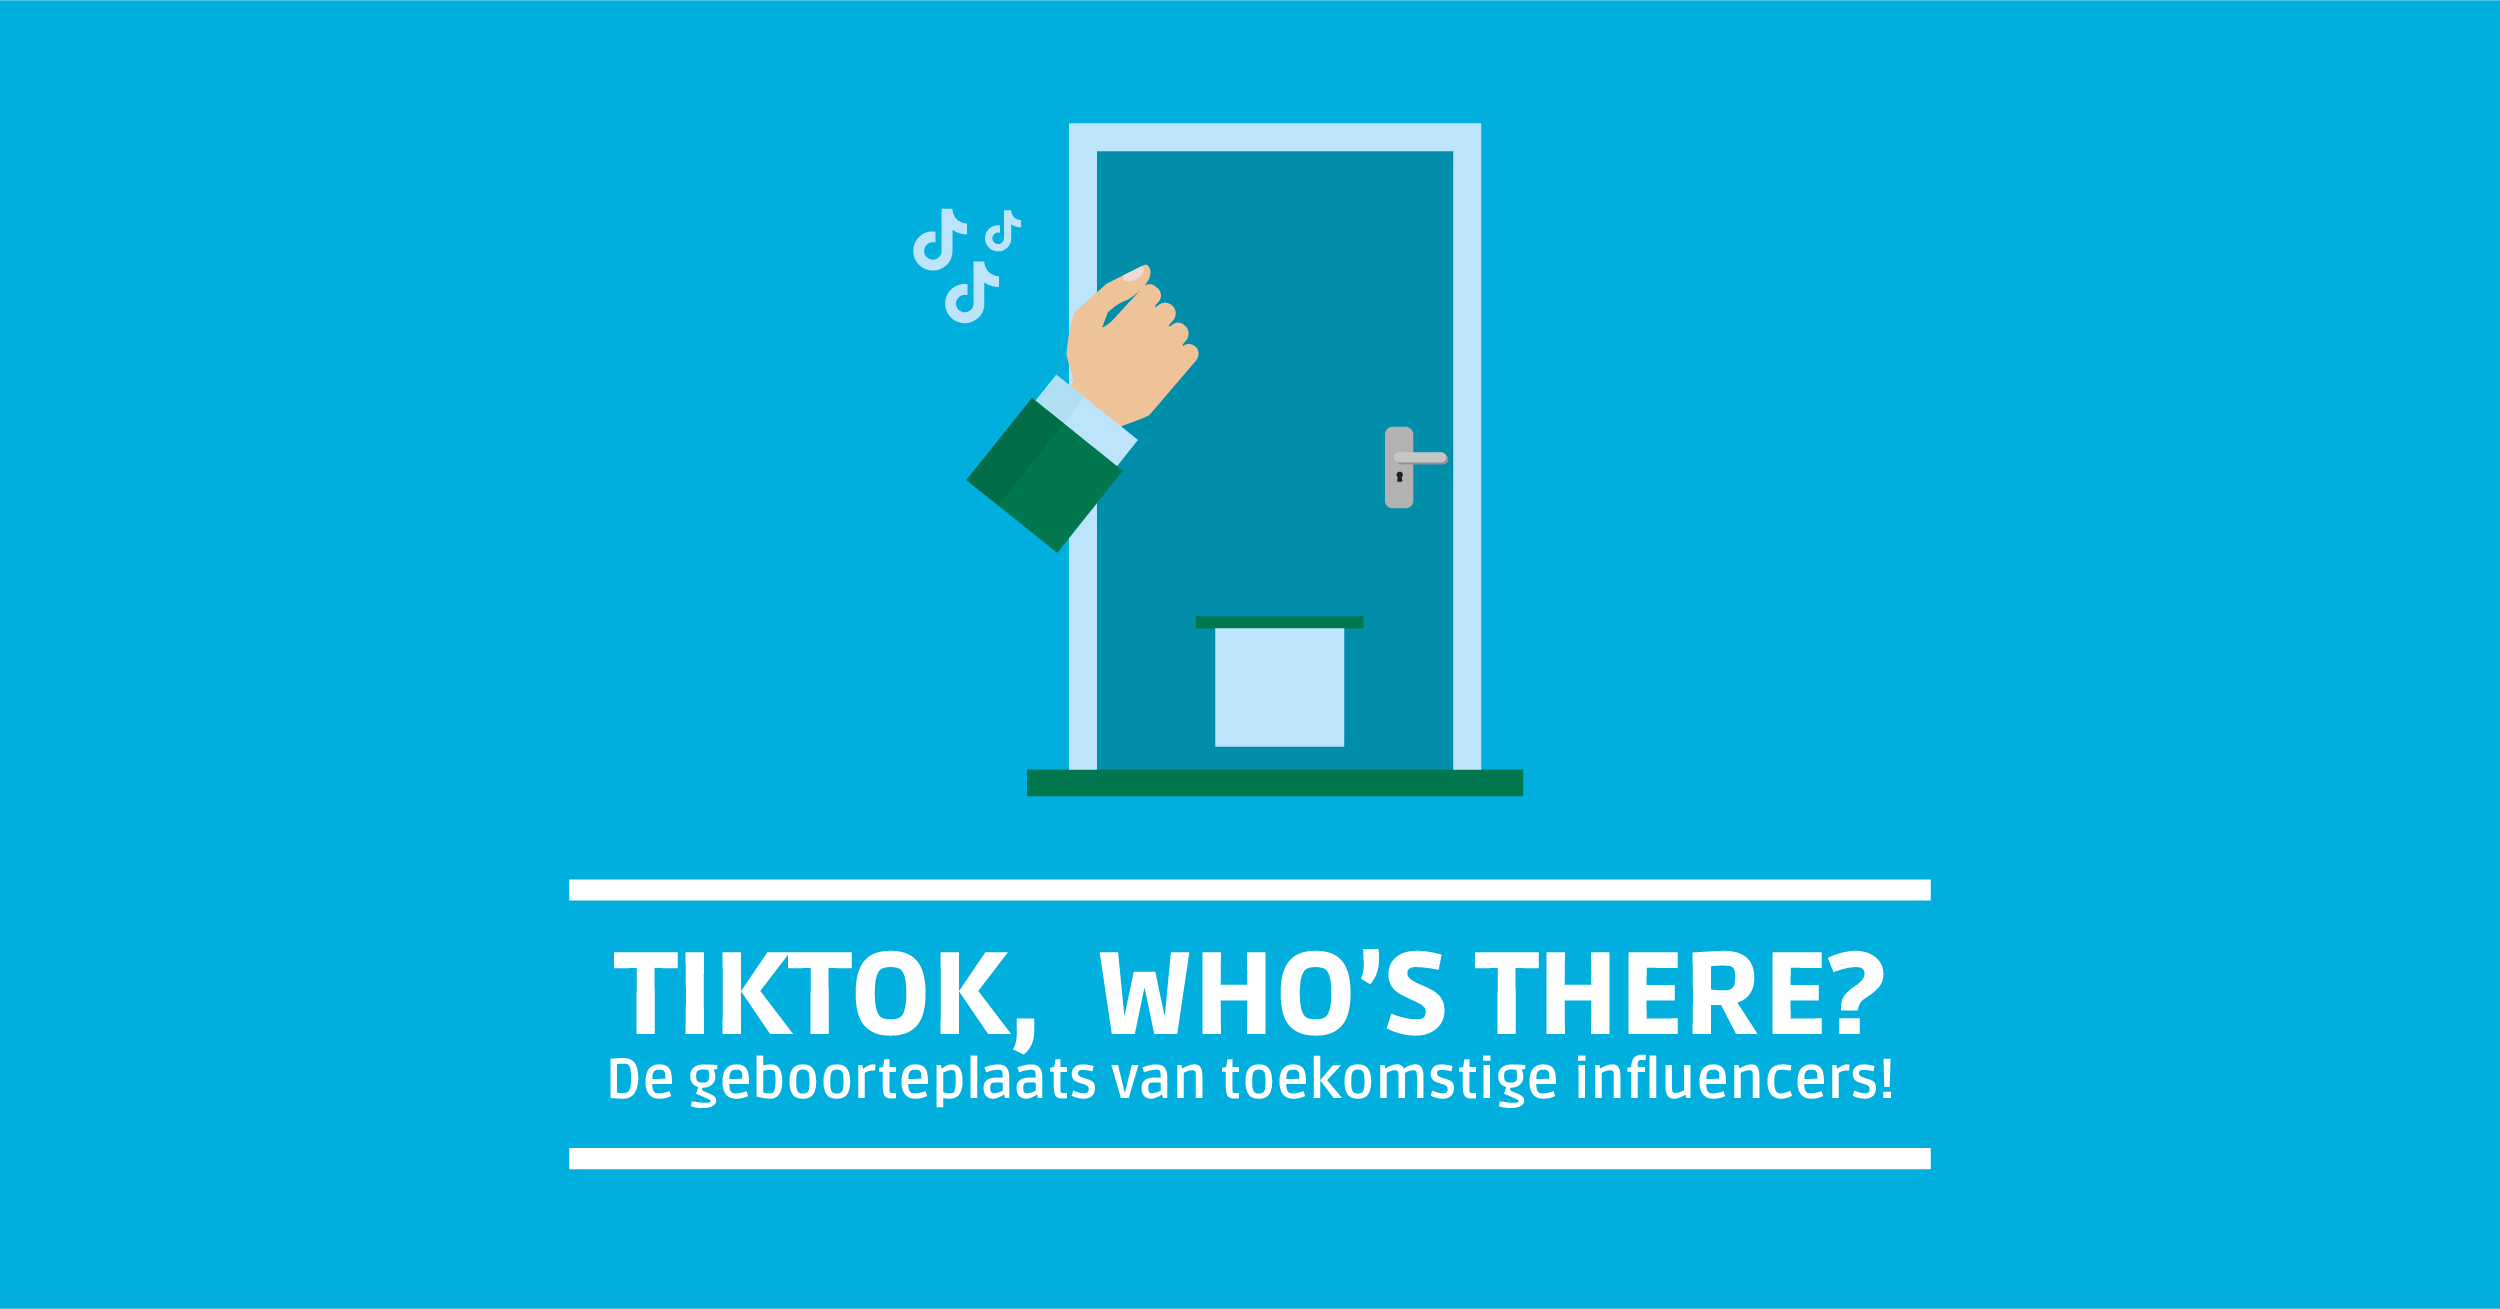 TikTok, who's there?